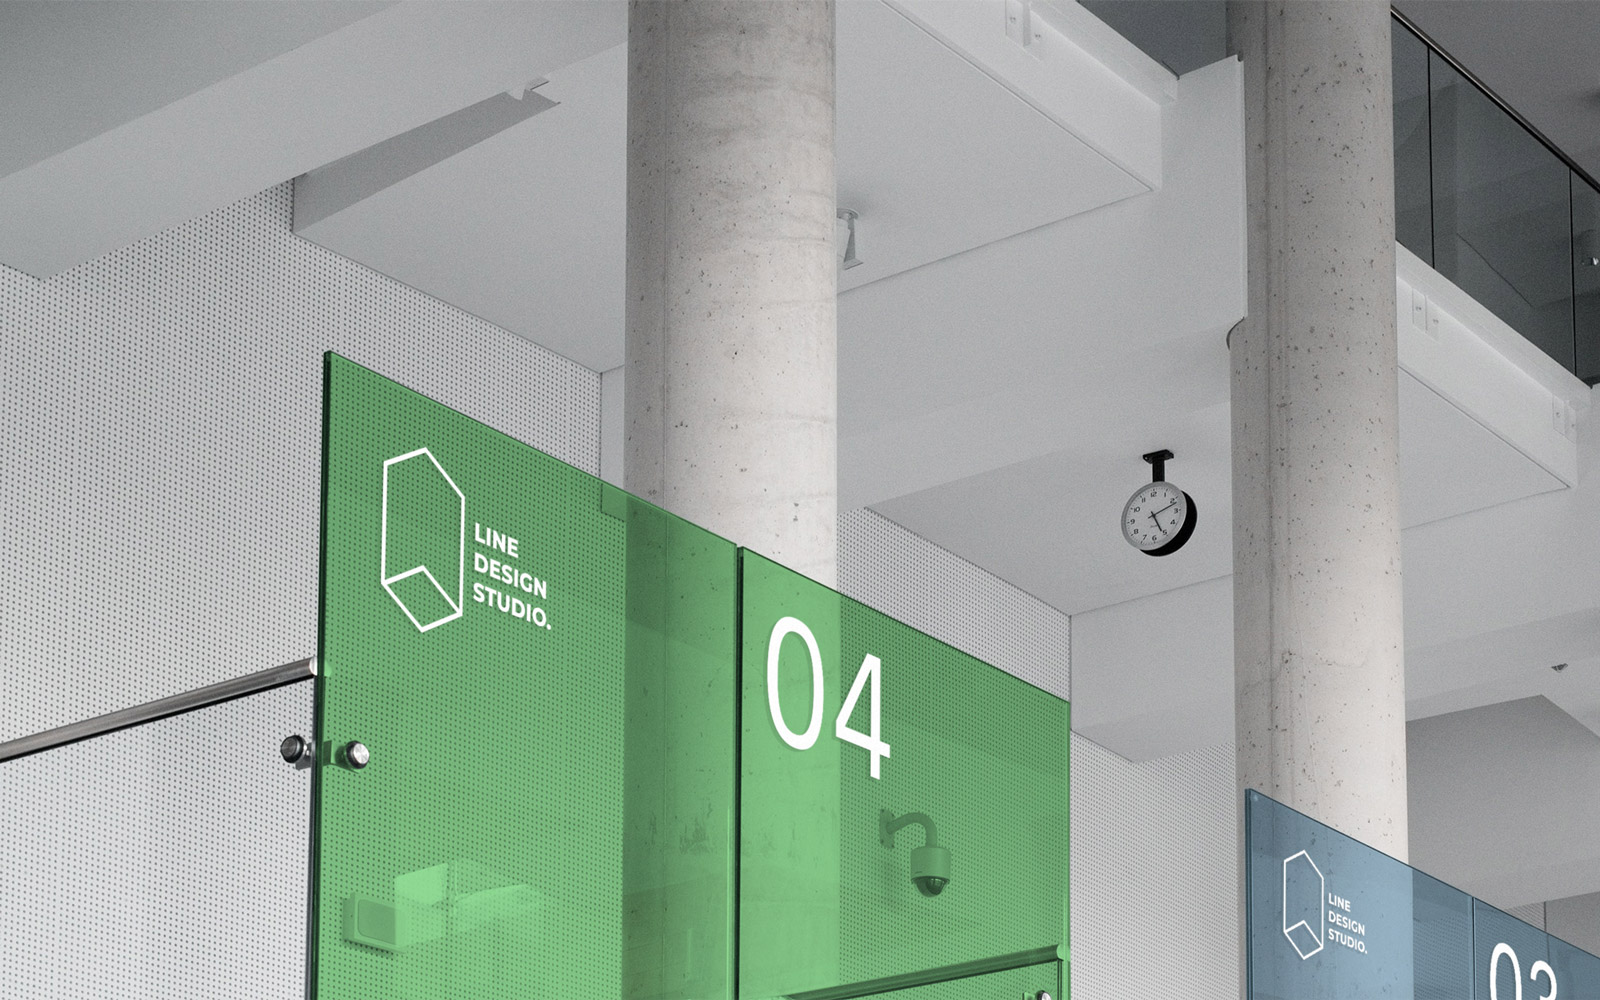 Line Design Studio